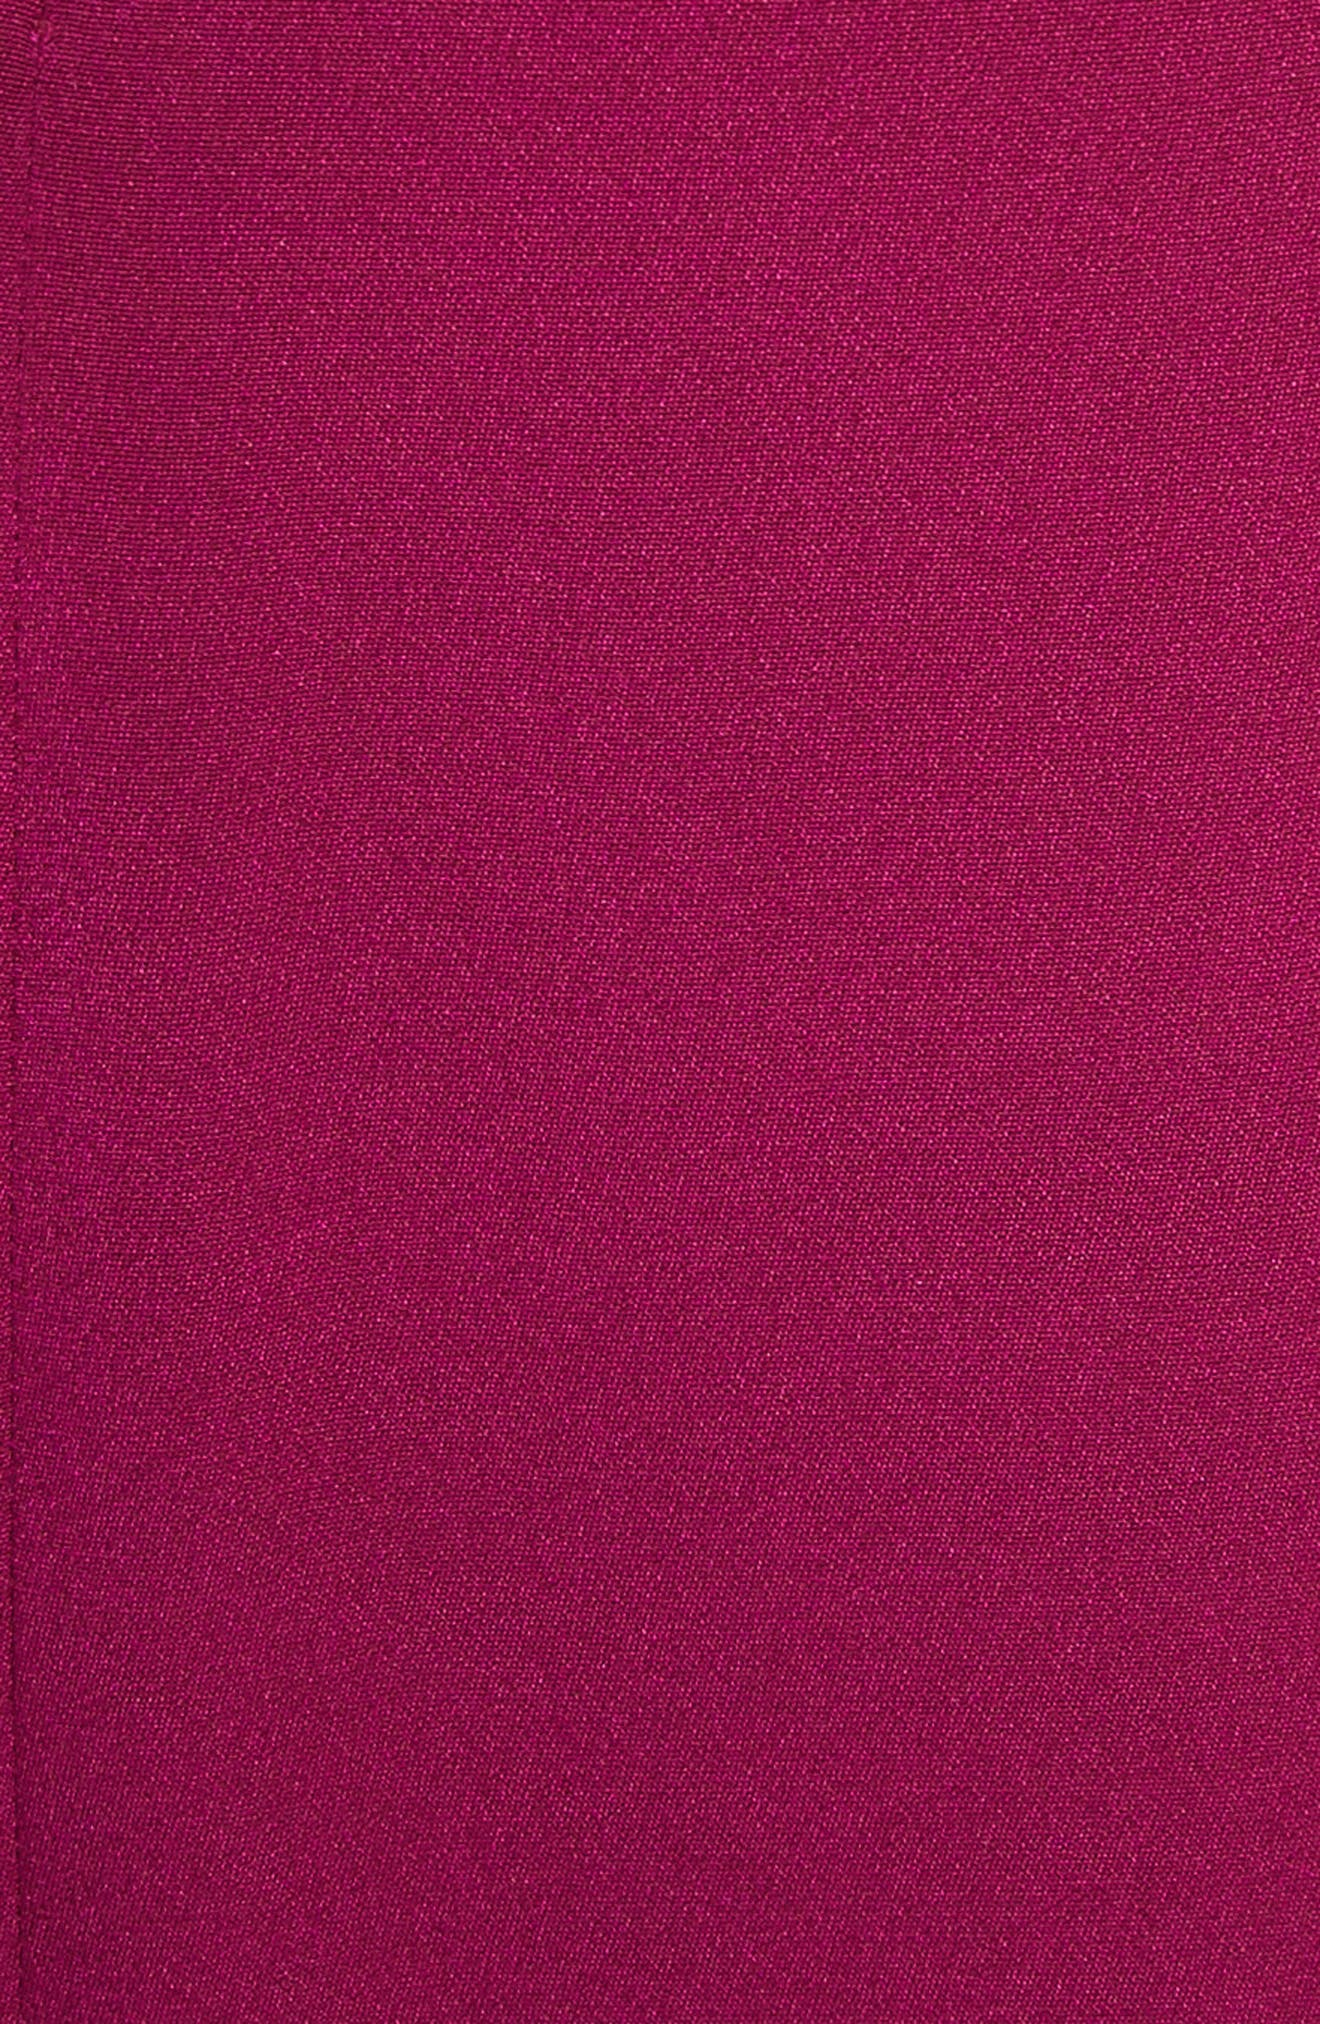 Cold Shoulder Ruffle Silk Sheath Dress,                             Alternate thumbnail 5, color,                             Dahlia